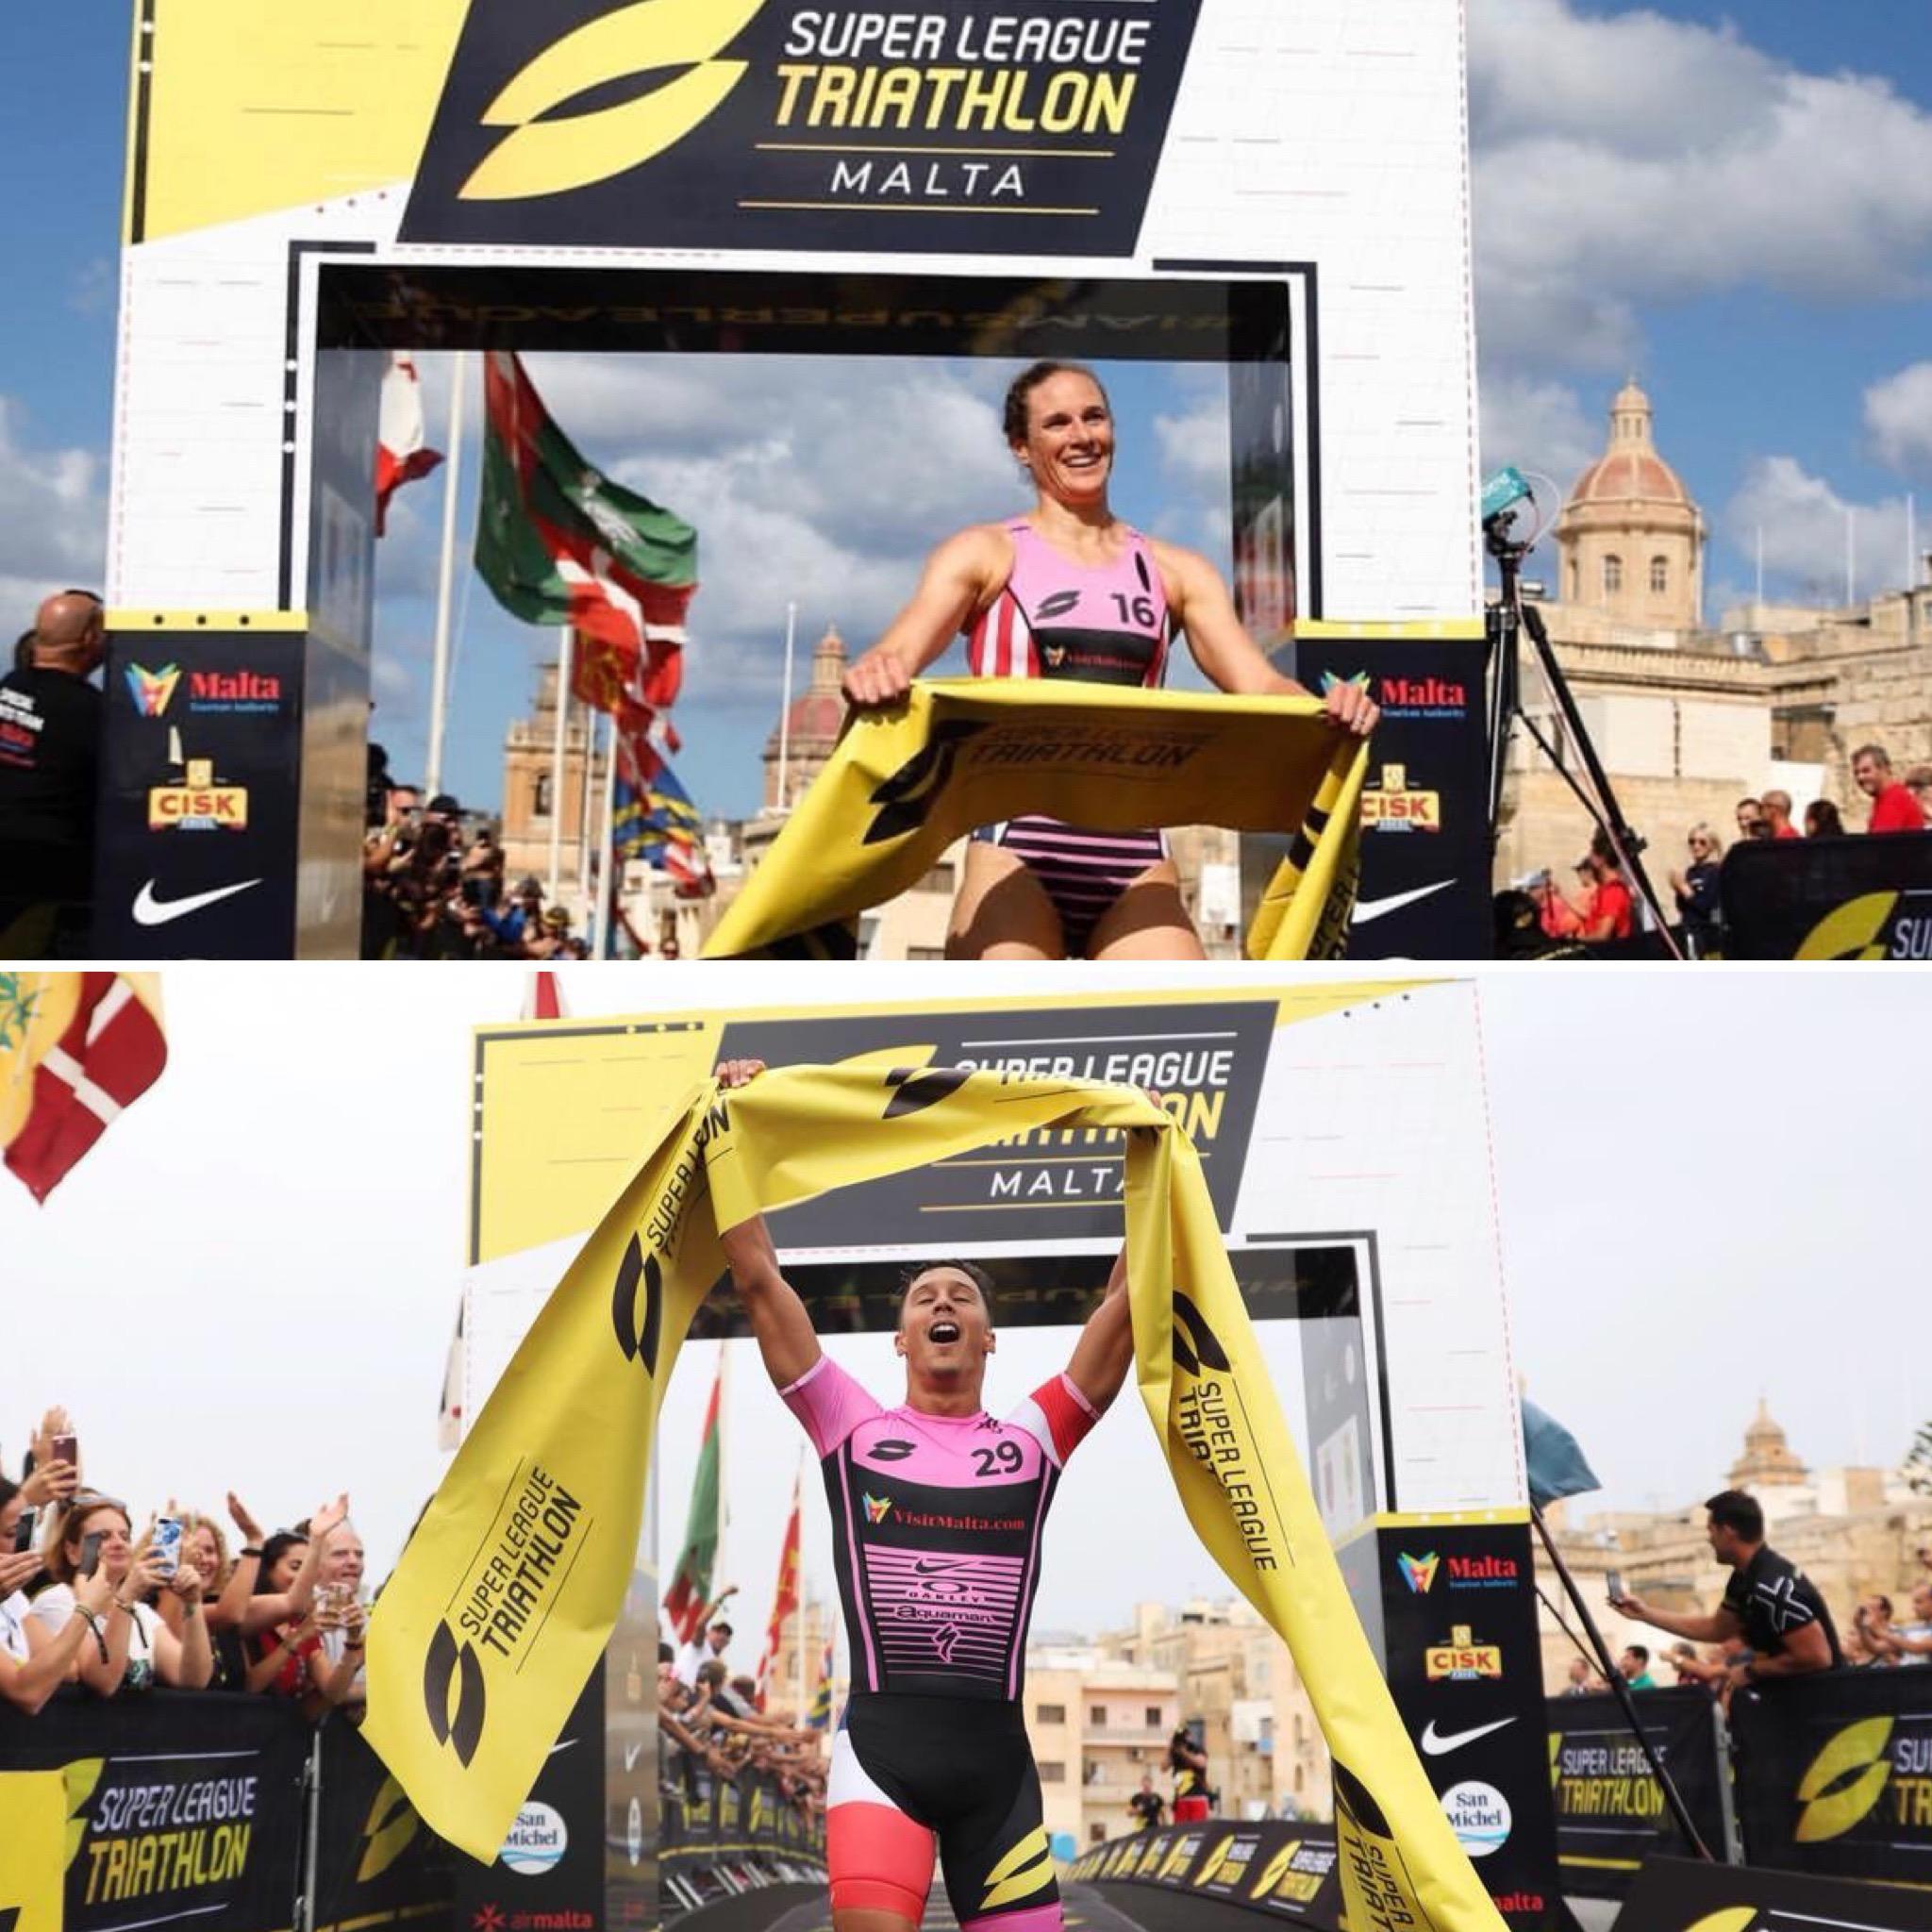 Katie Zaferes and Vincent Luis winning Super League Malta 2018